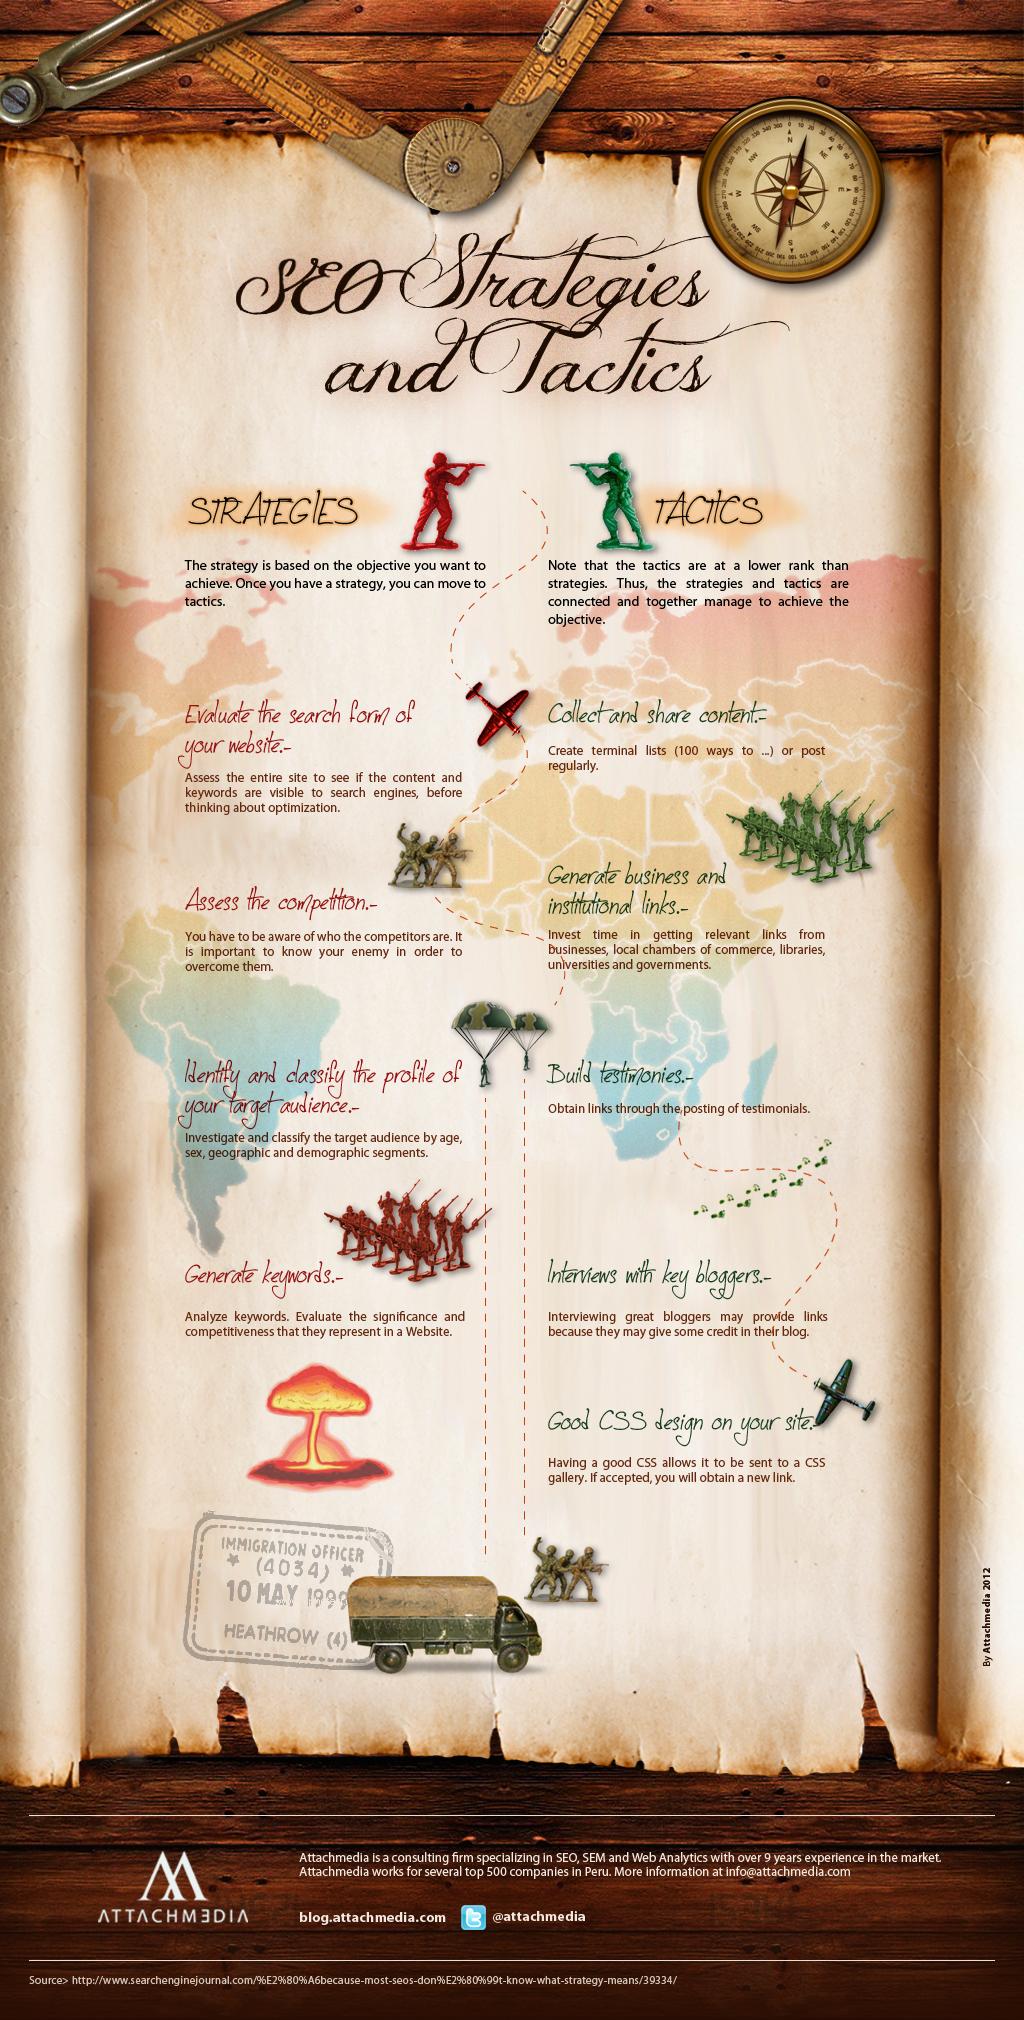 Best Strategies & Tactics of SEO